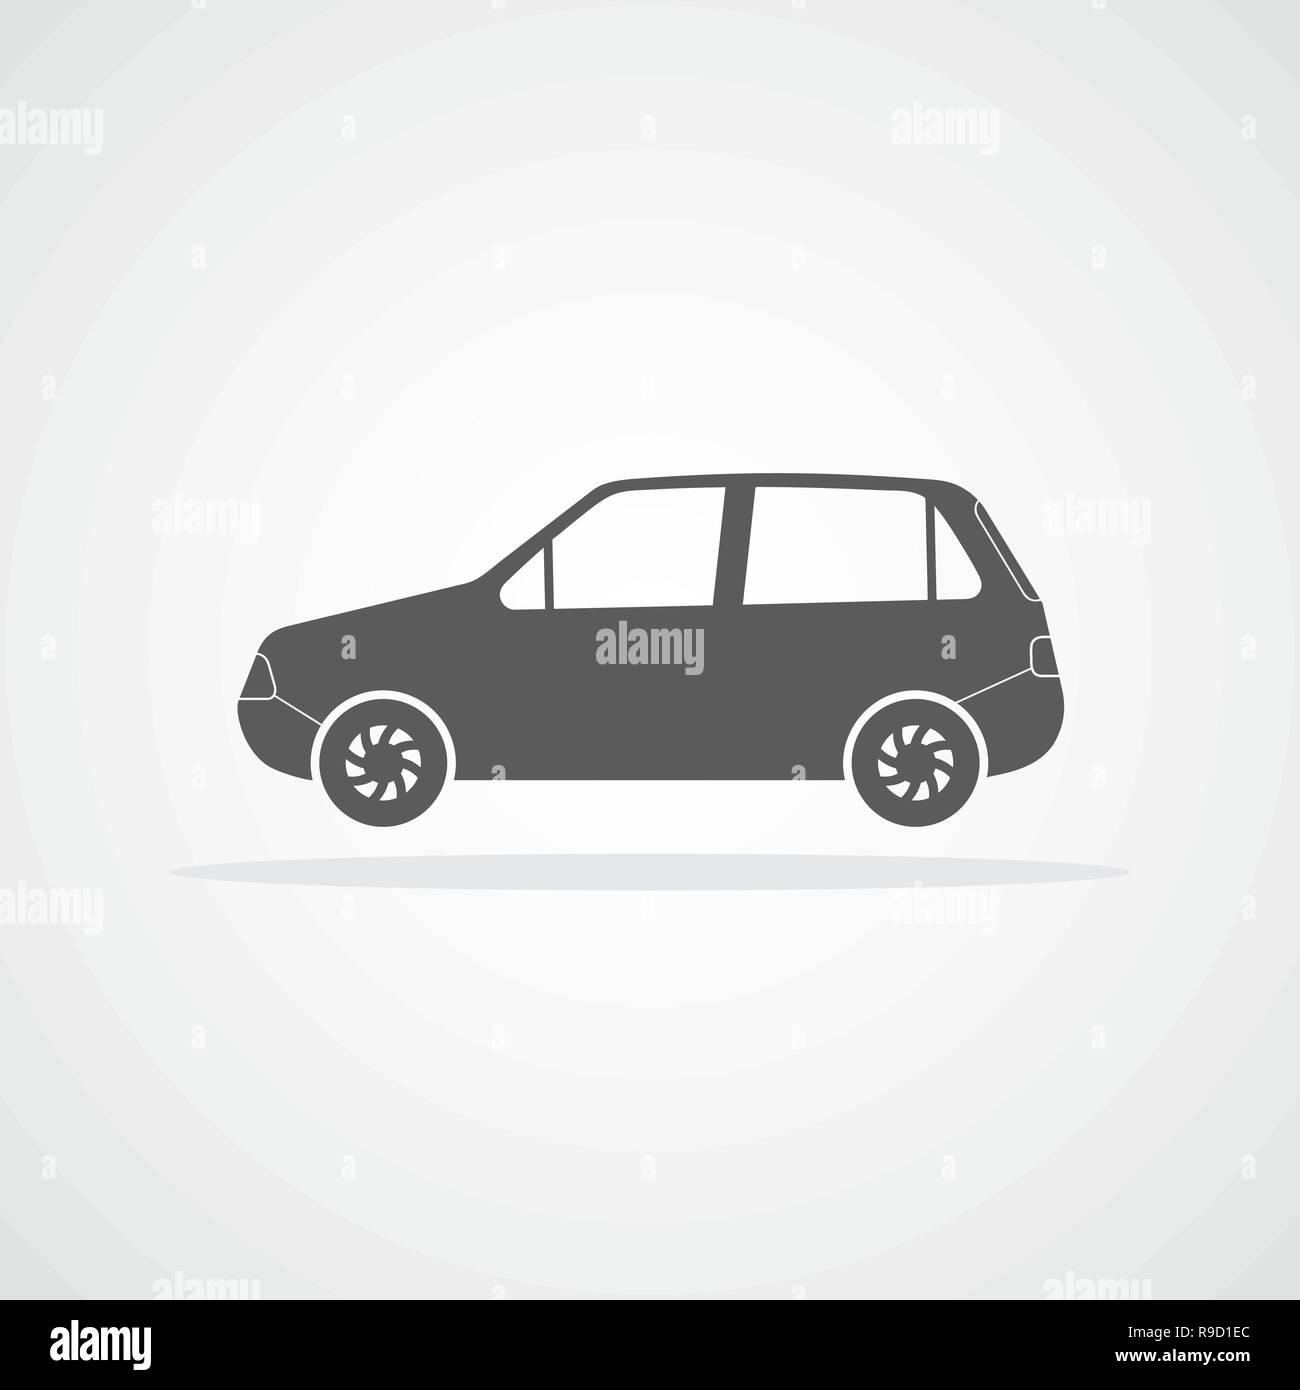 car icon vector illustration gray car icon R9D1EC